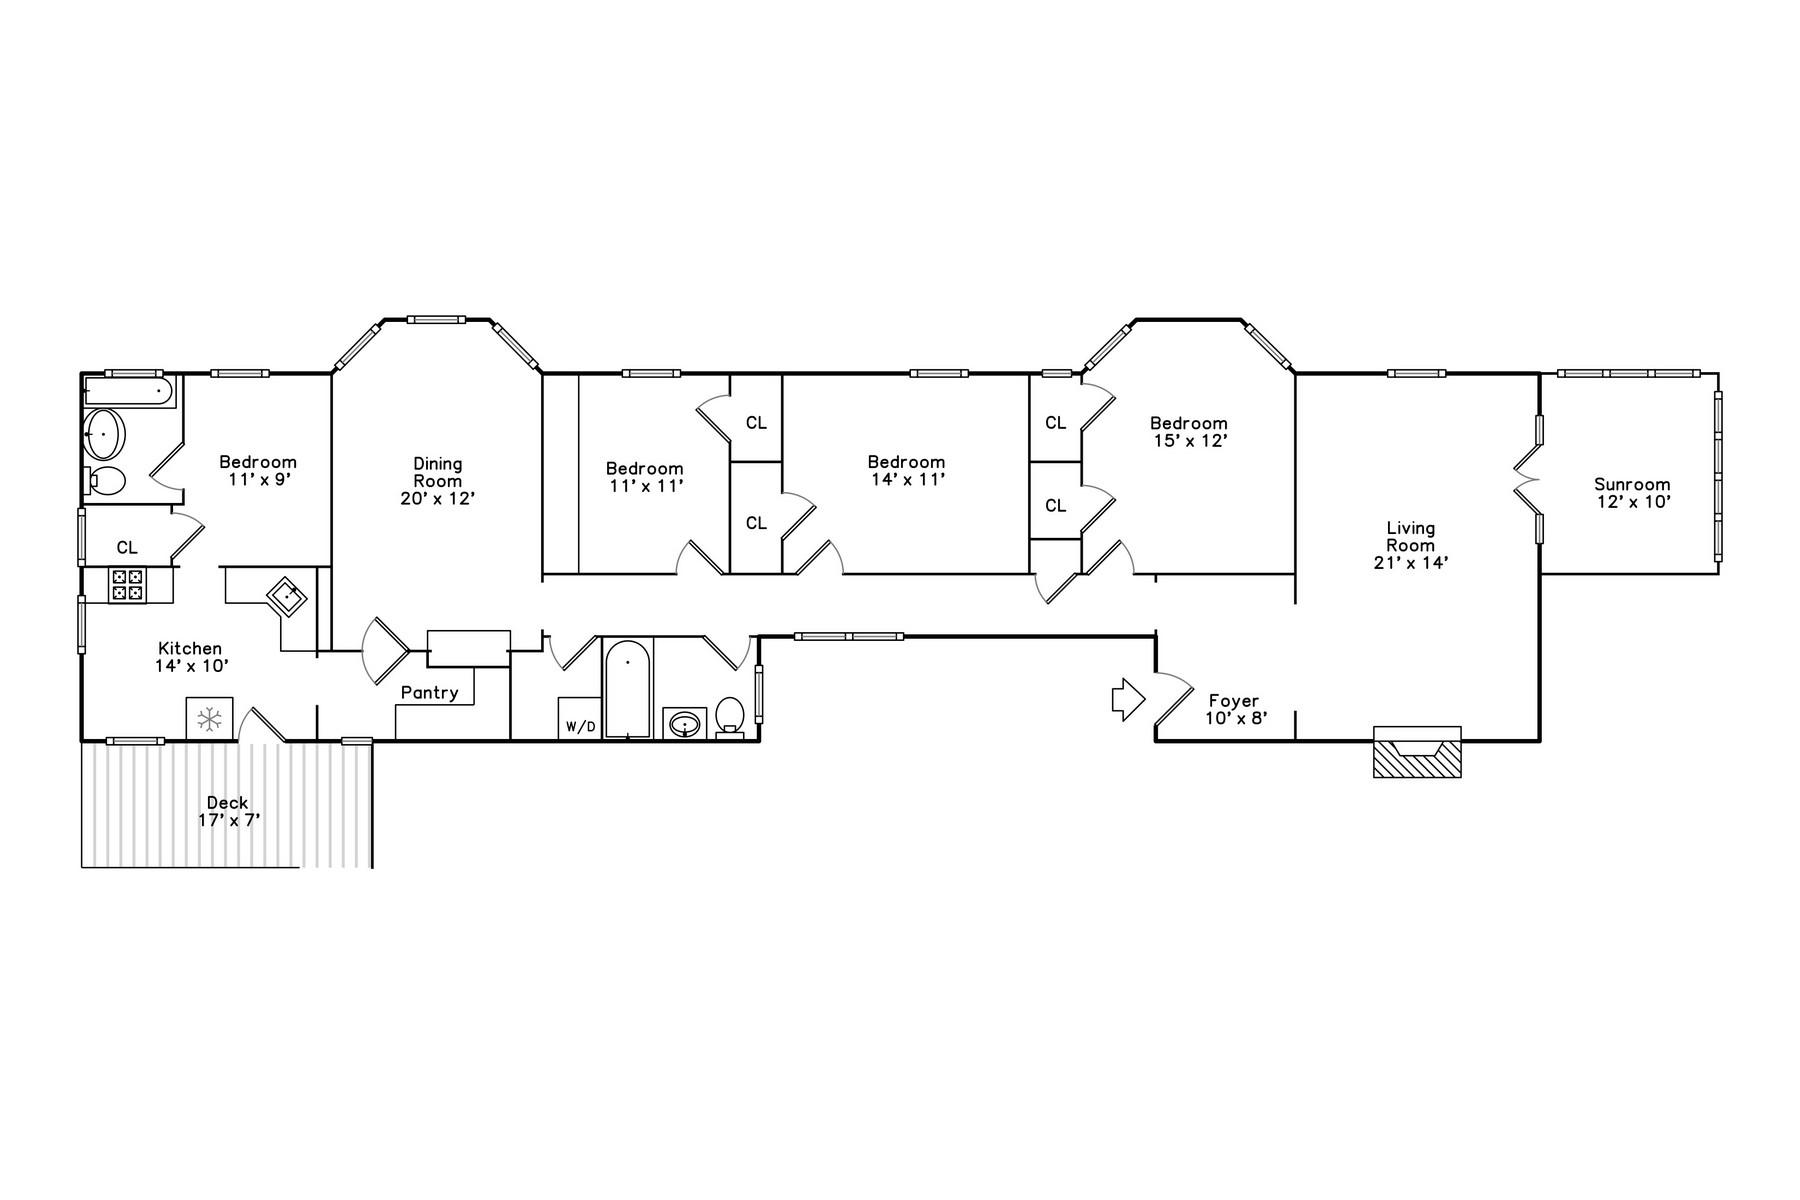 Single Family Home for Sale at Spacious Vintage Evanson Condo 1633 Hinman Avenue Unit 3S Evanston, Illinois 60201 United States